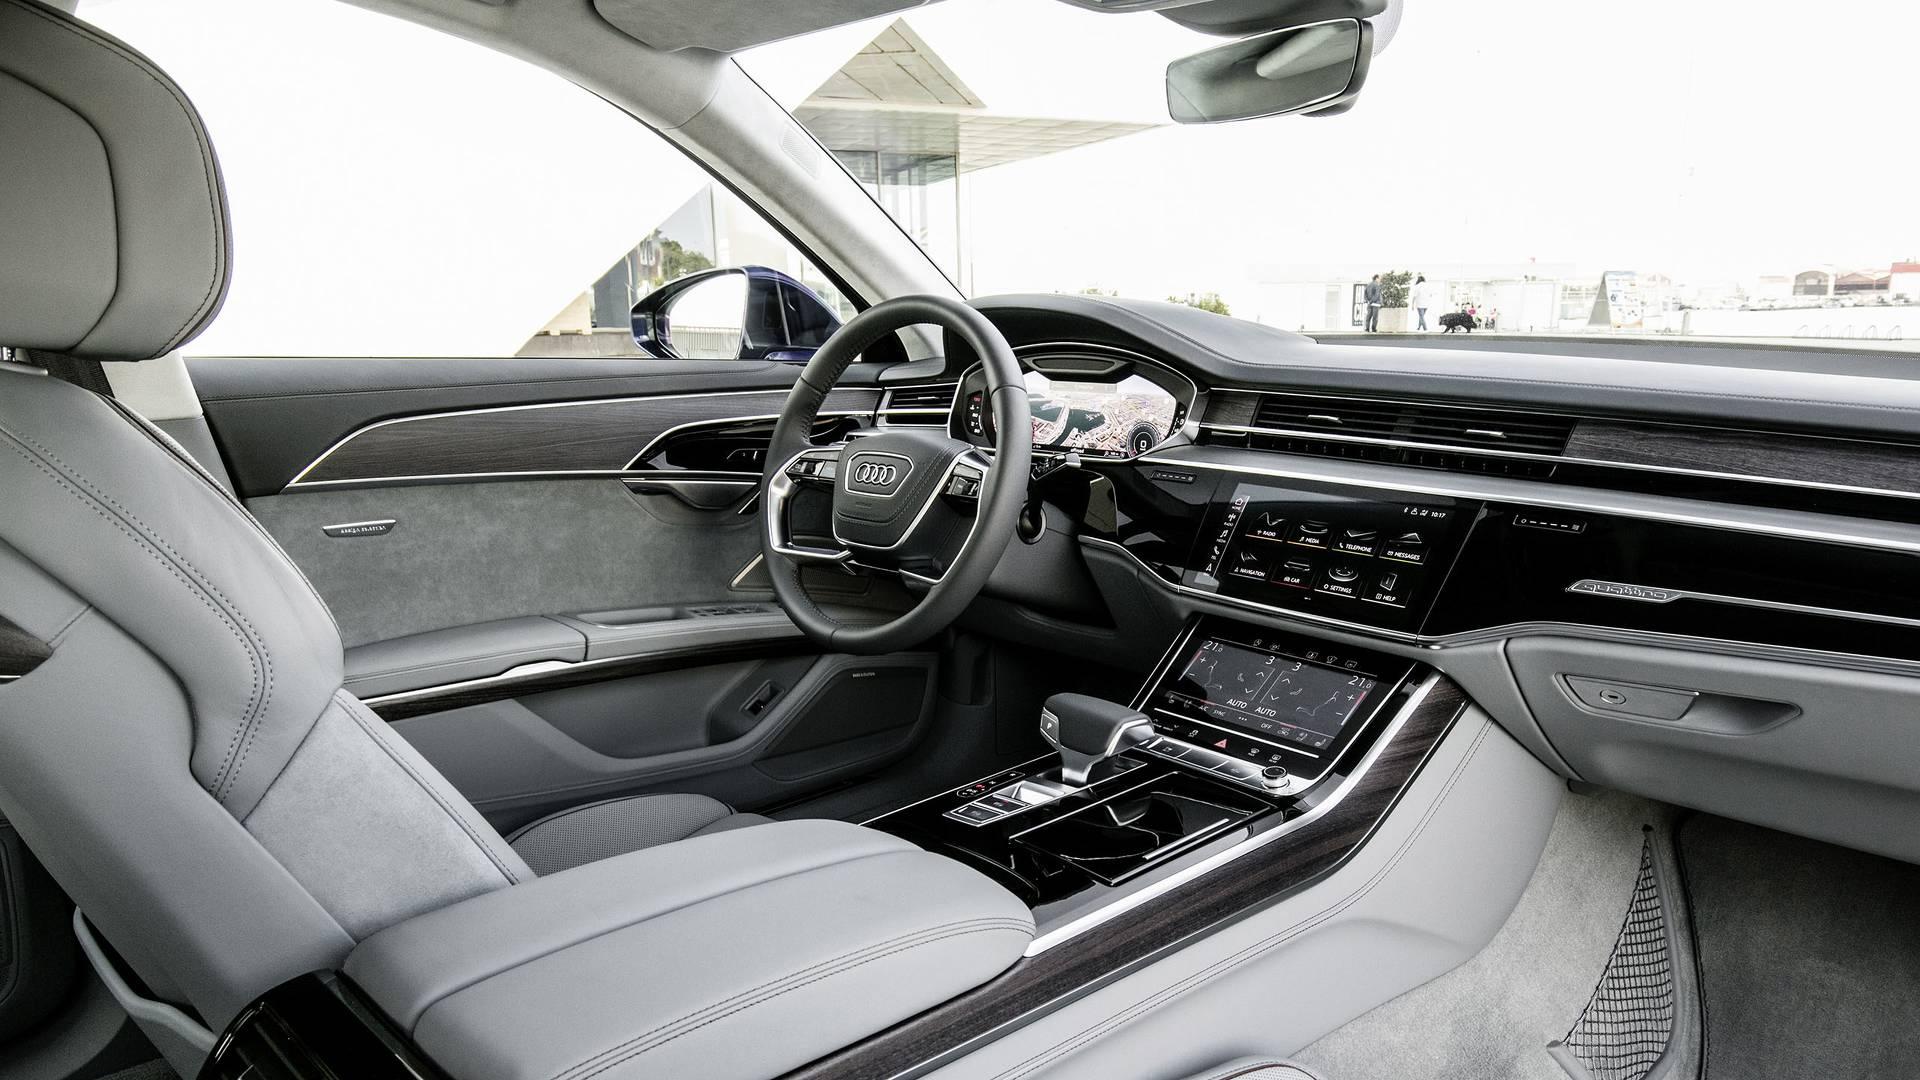 2019-audi-a8-first-drive (2).jpg